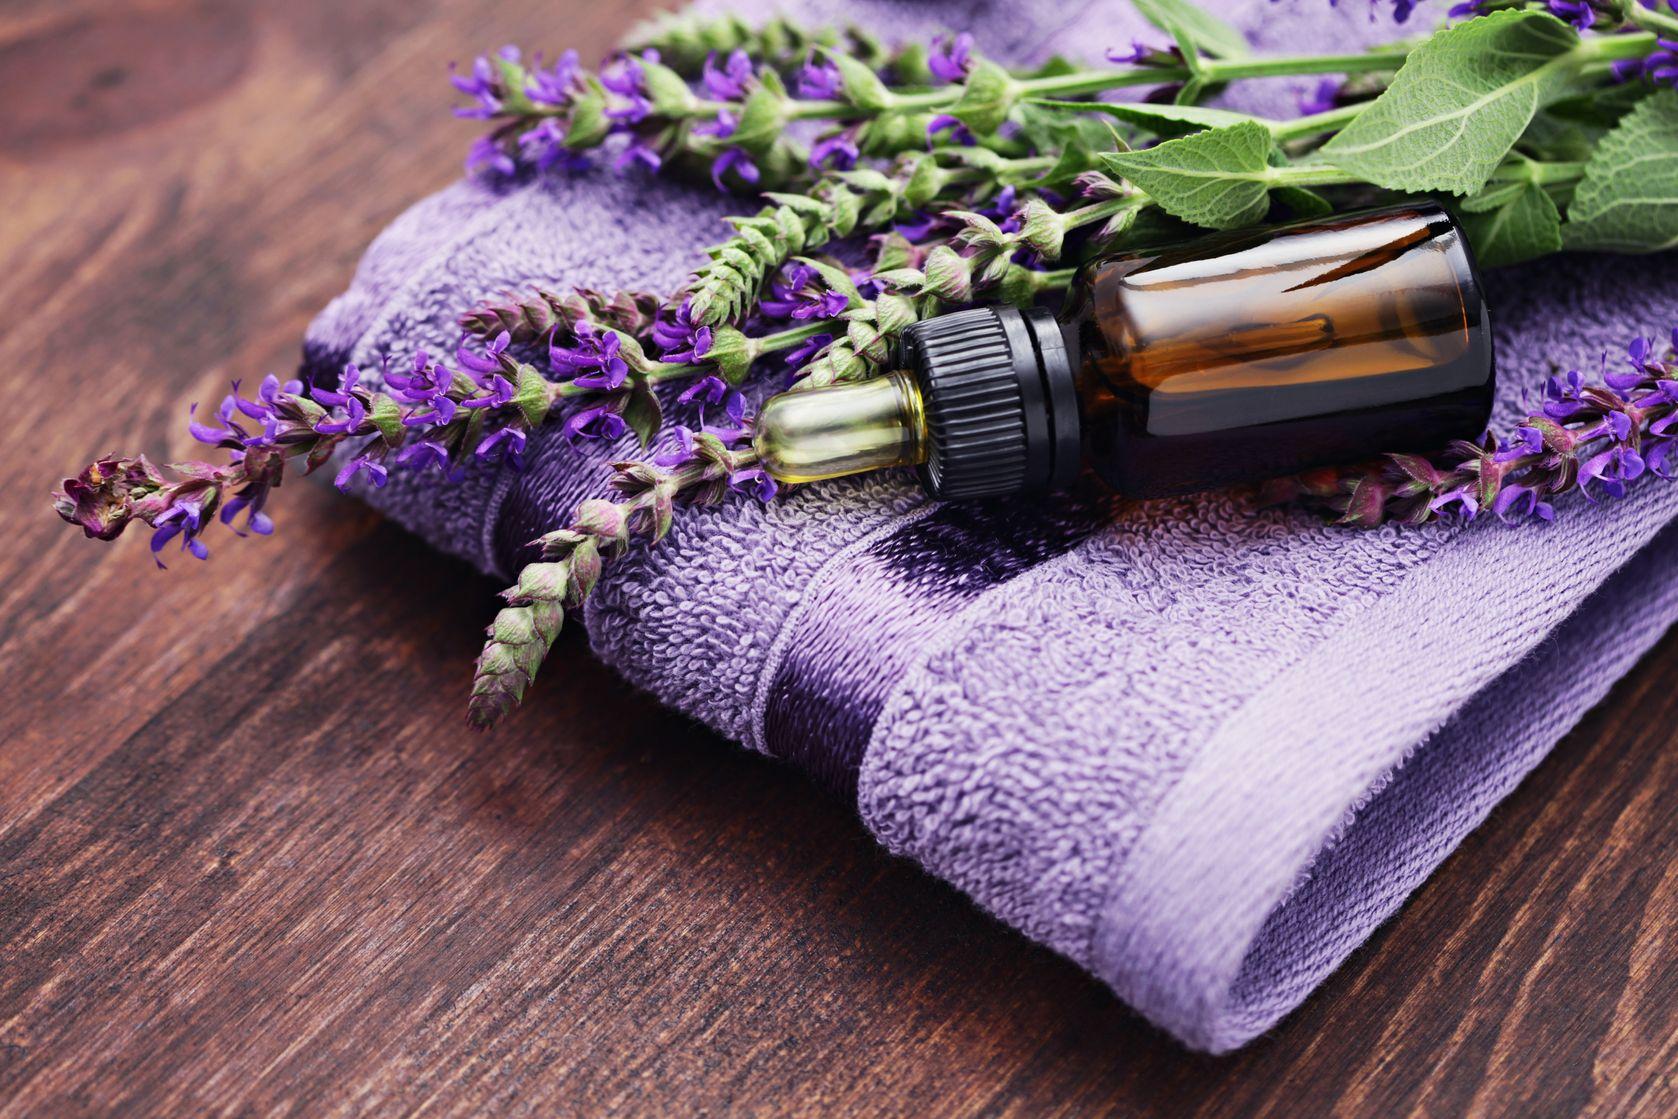 Lavender-oil-as-essential-oils-for-sore-throat